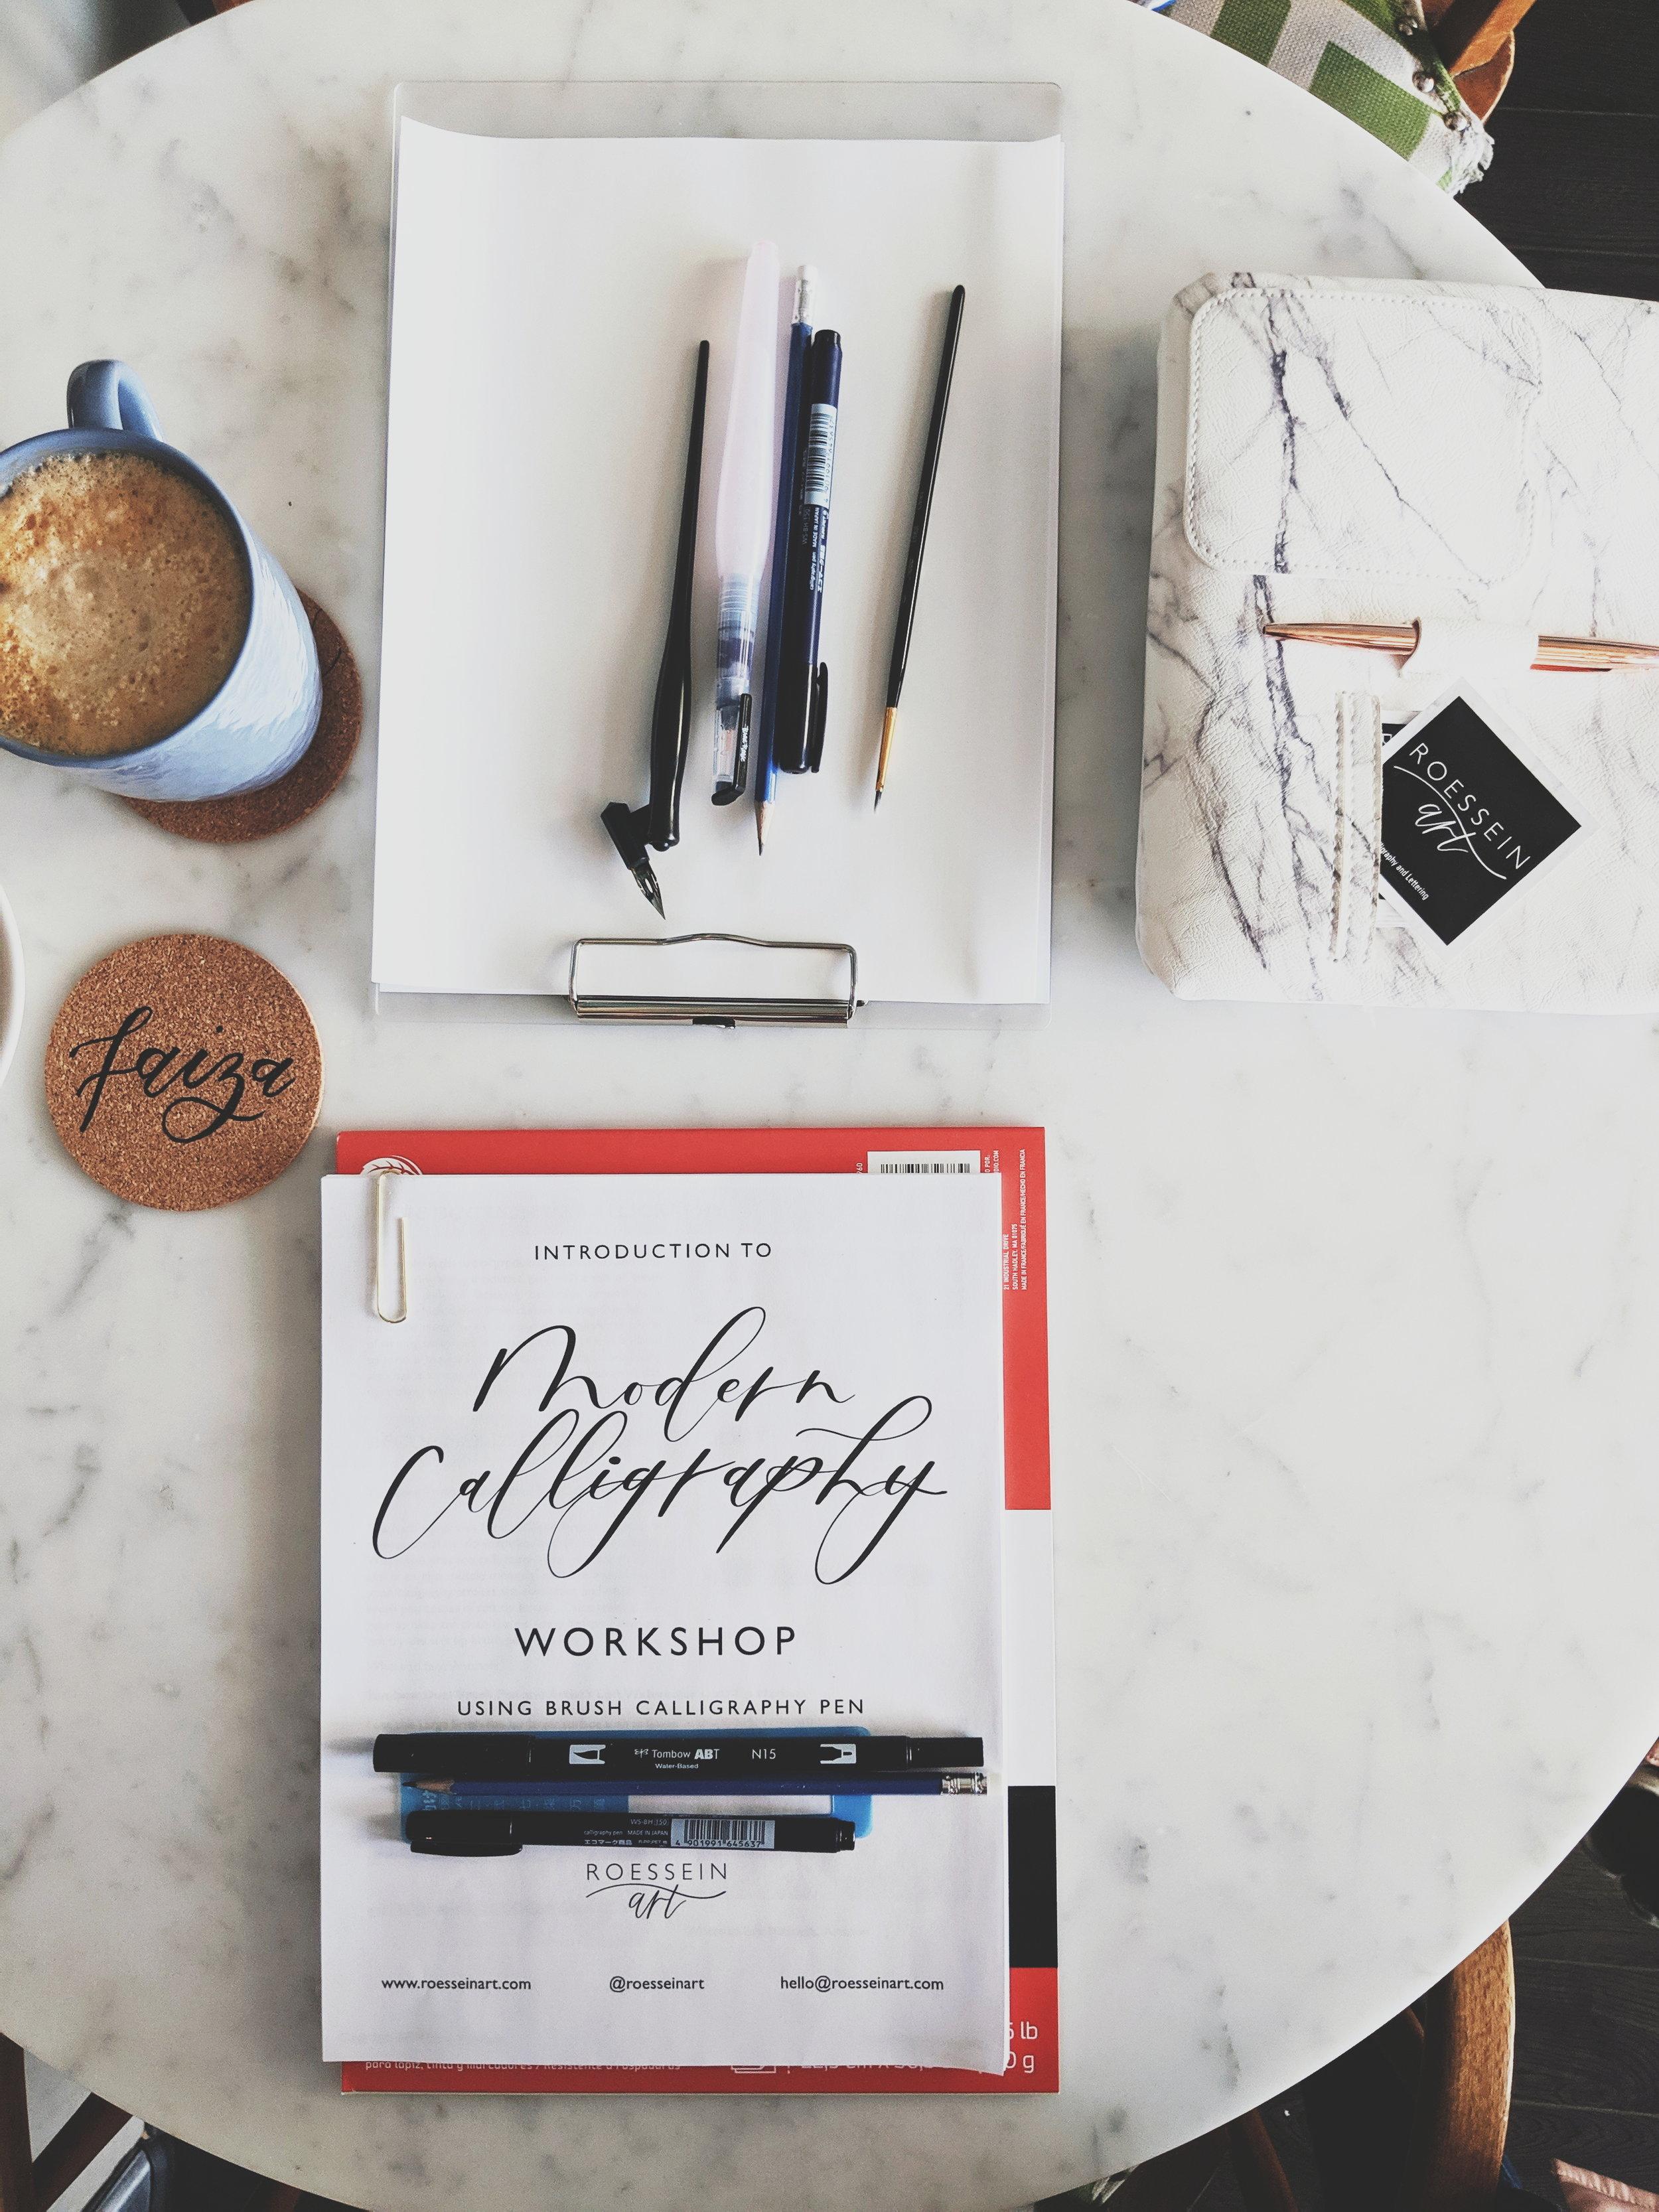 Toronto_Calligraphy_workshop.jpg